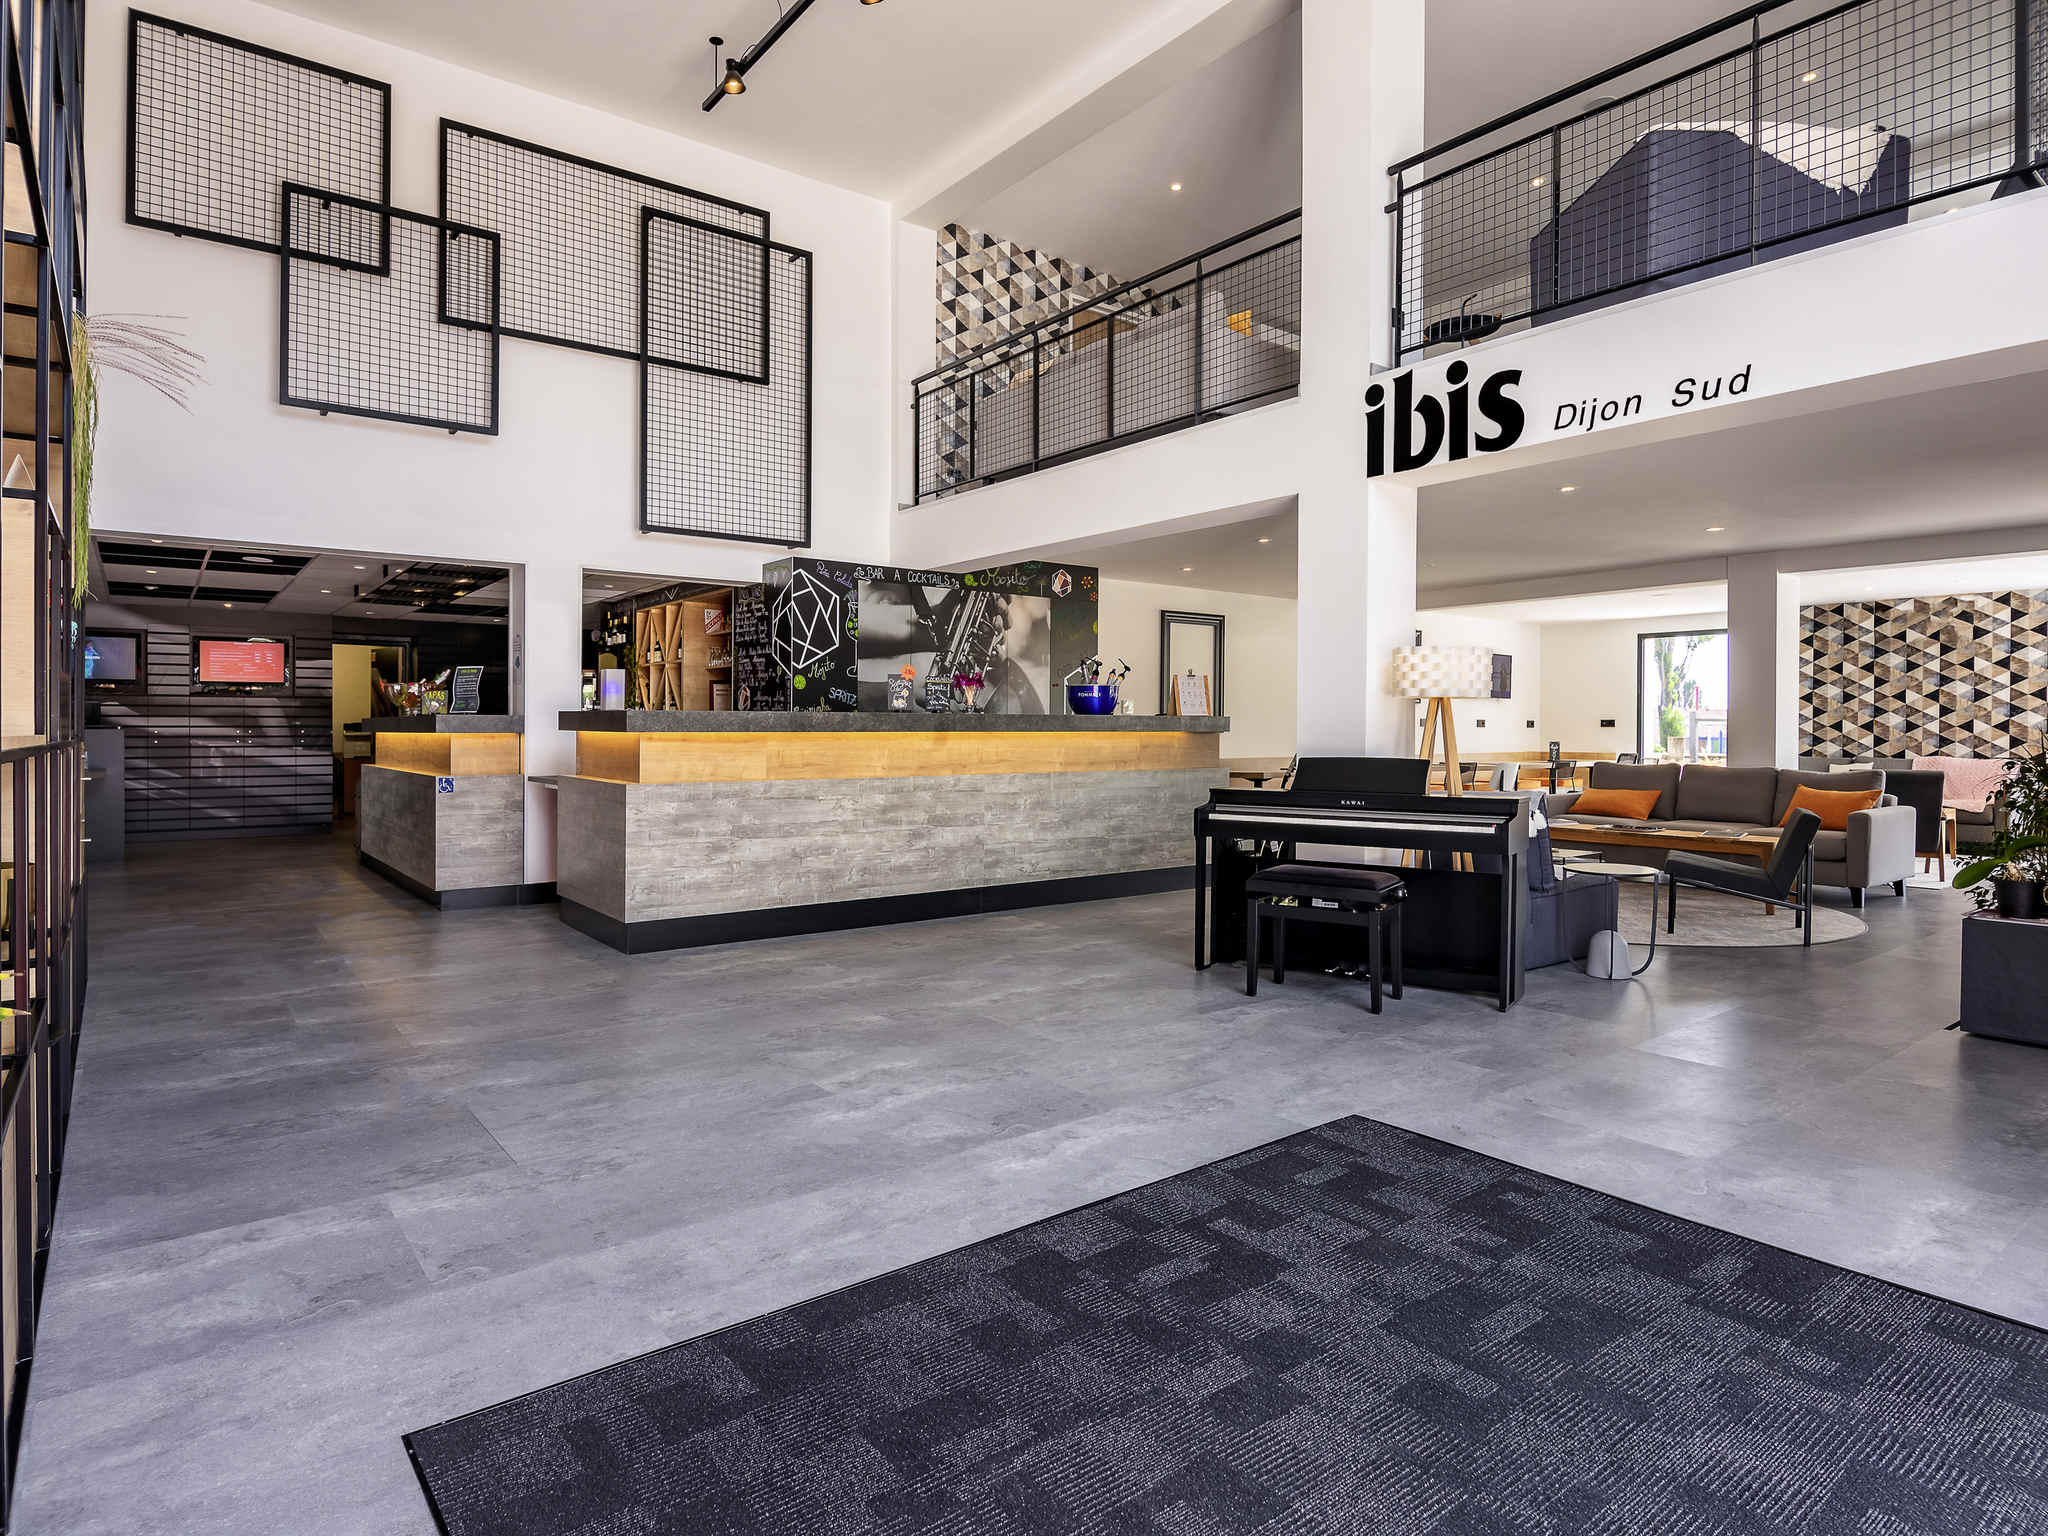 Hotel – ibis Dijon Sud